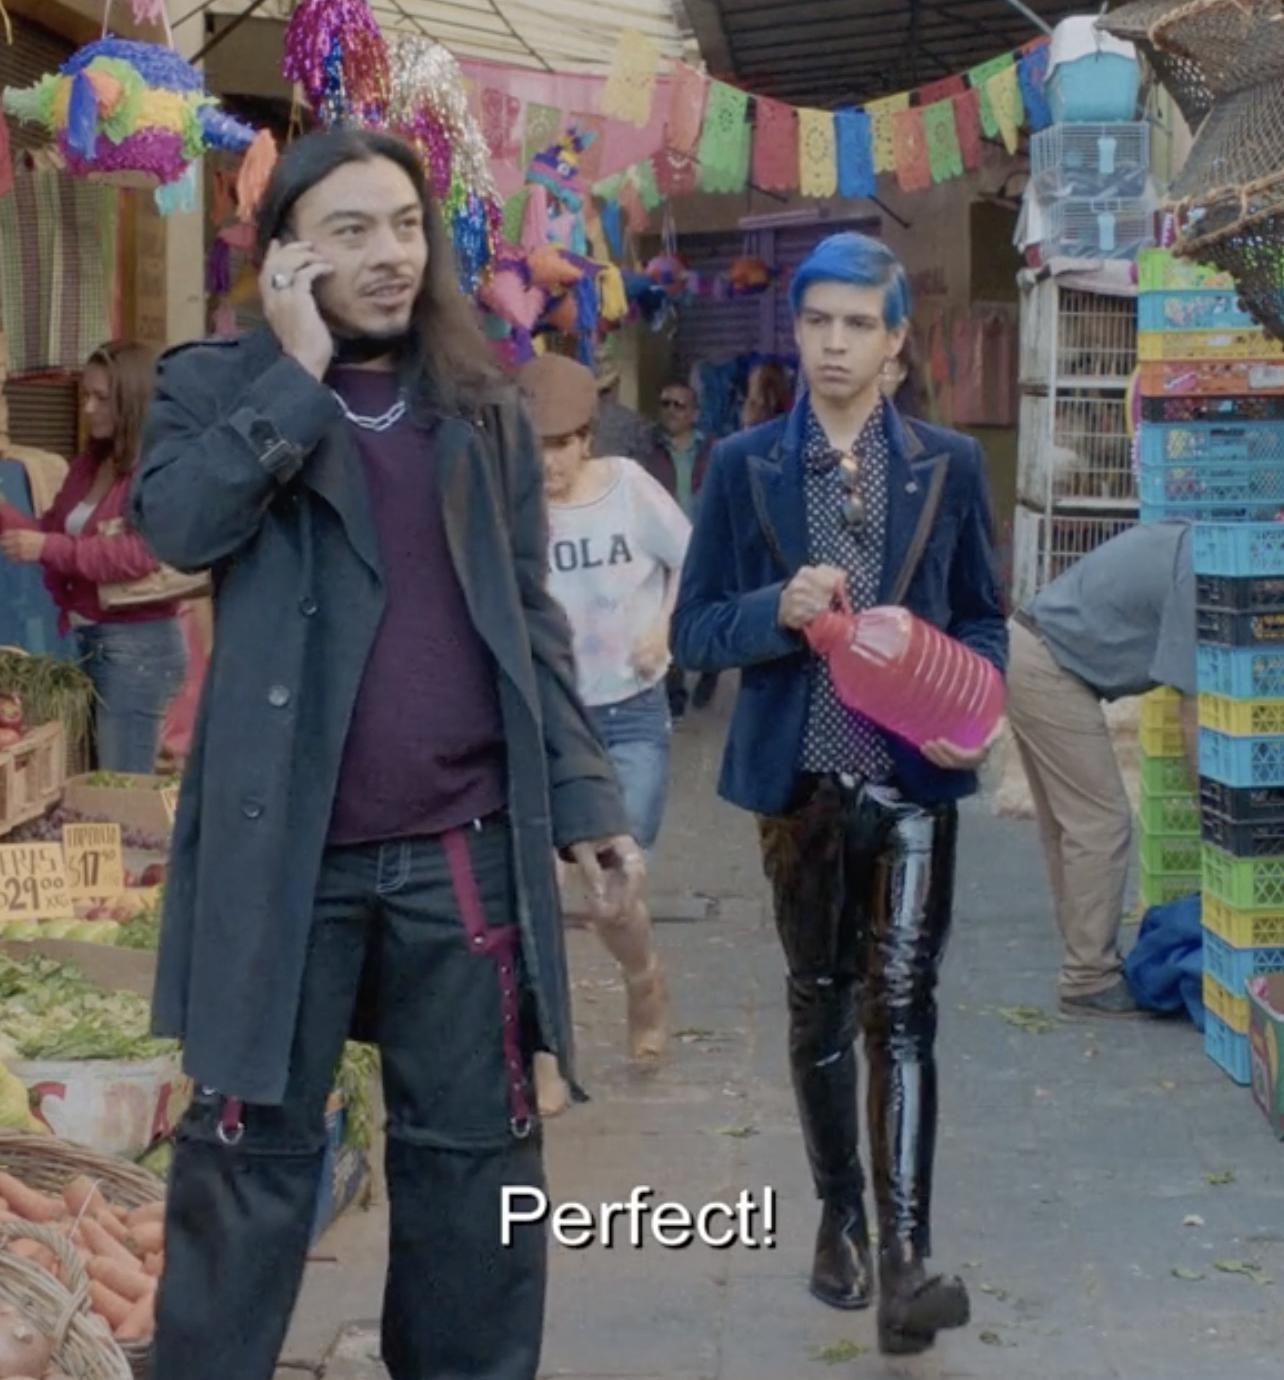 Andres walking towards Renaldo at an outdoor market